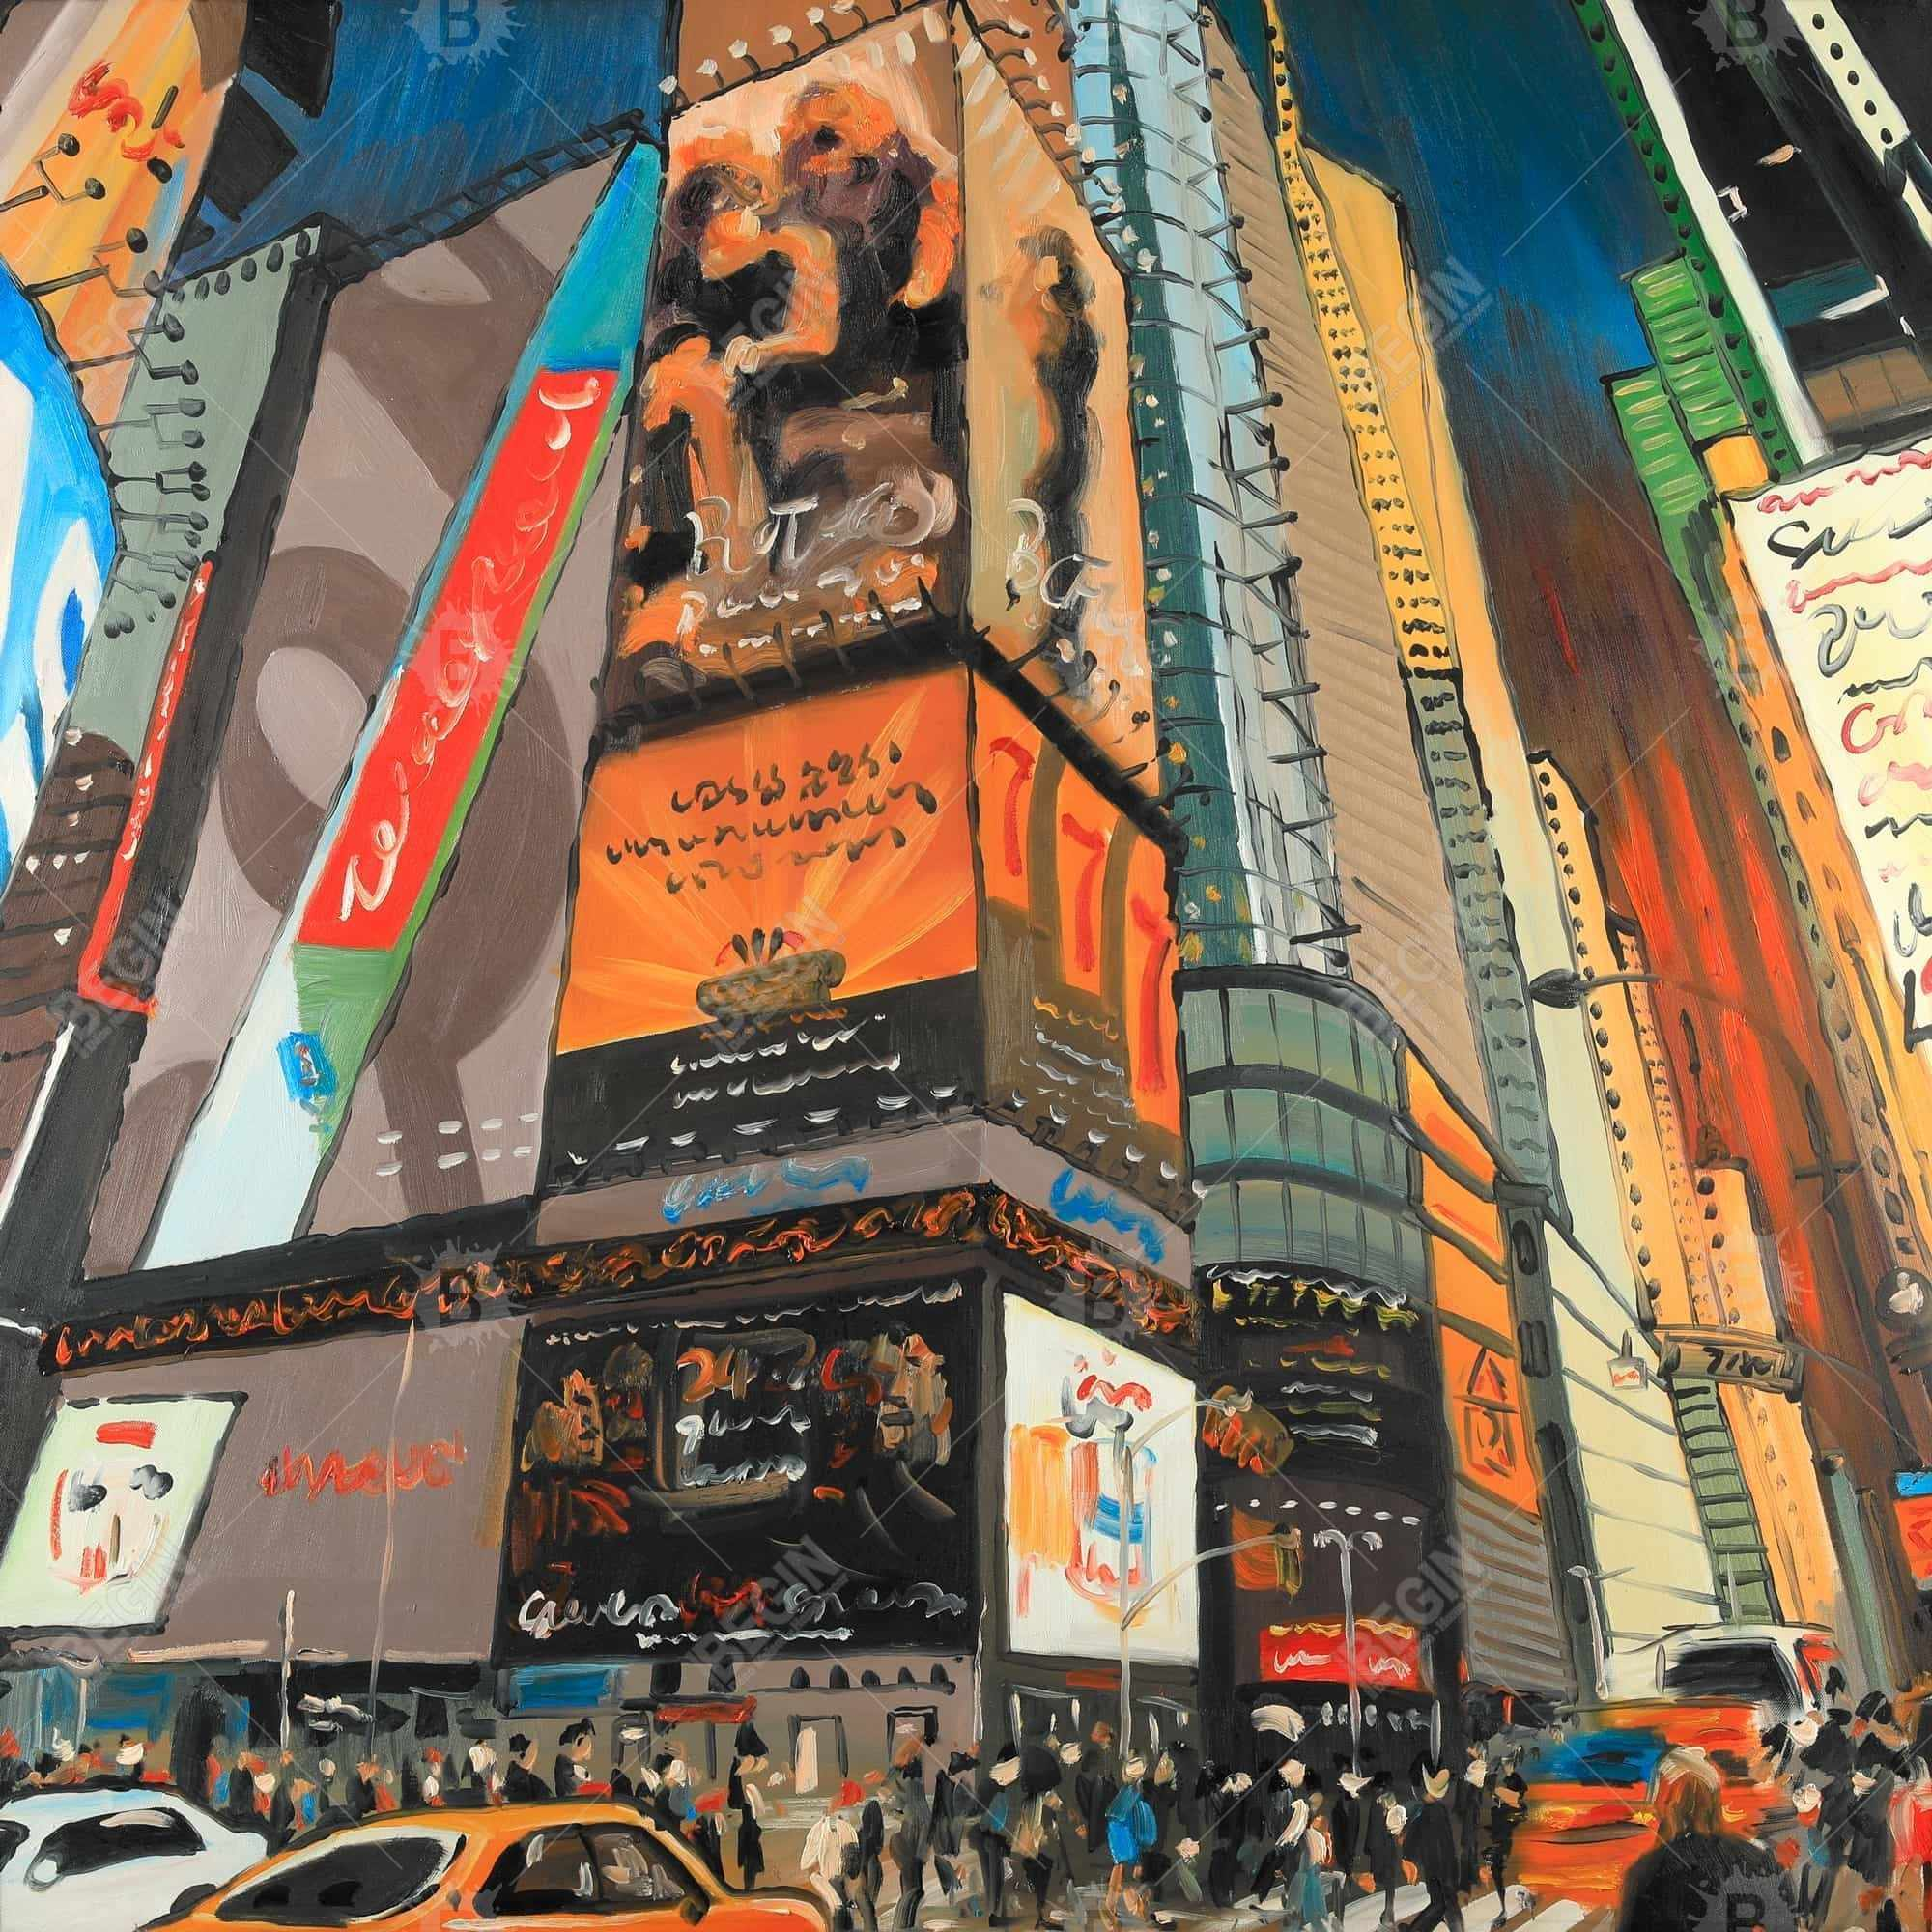 Illuminated new york city street